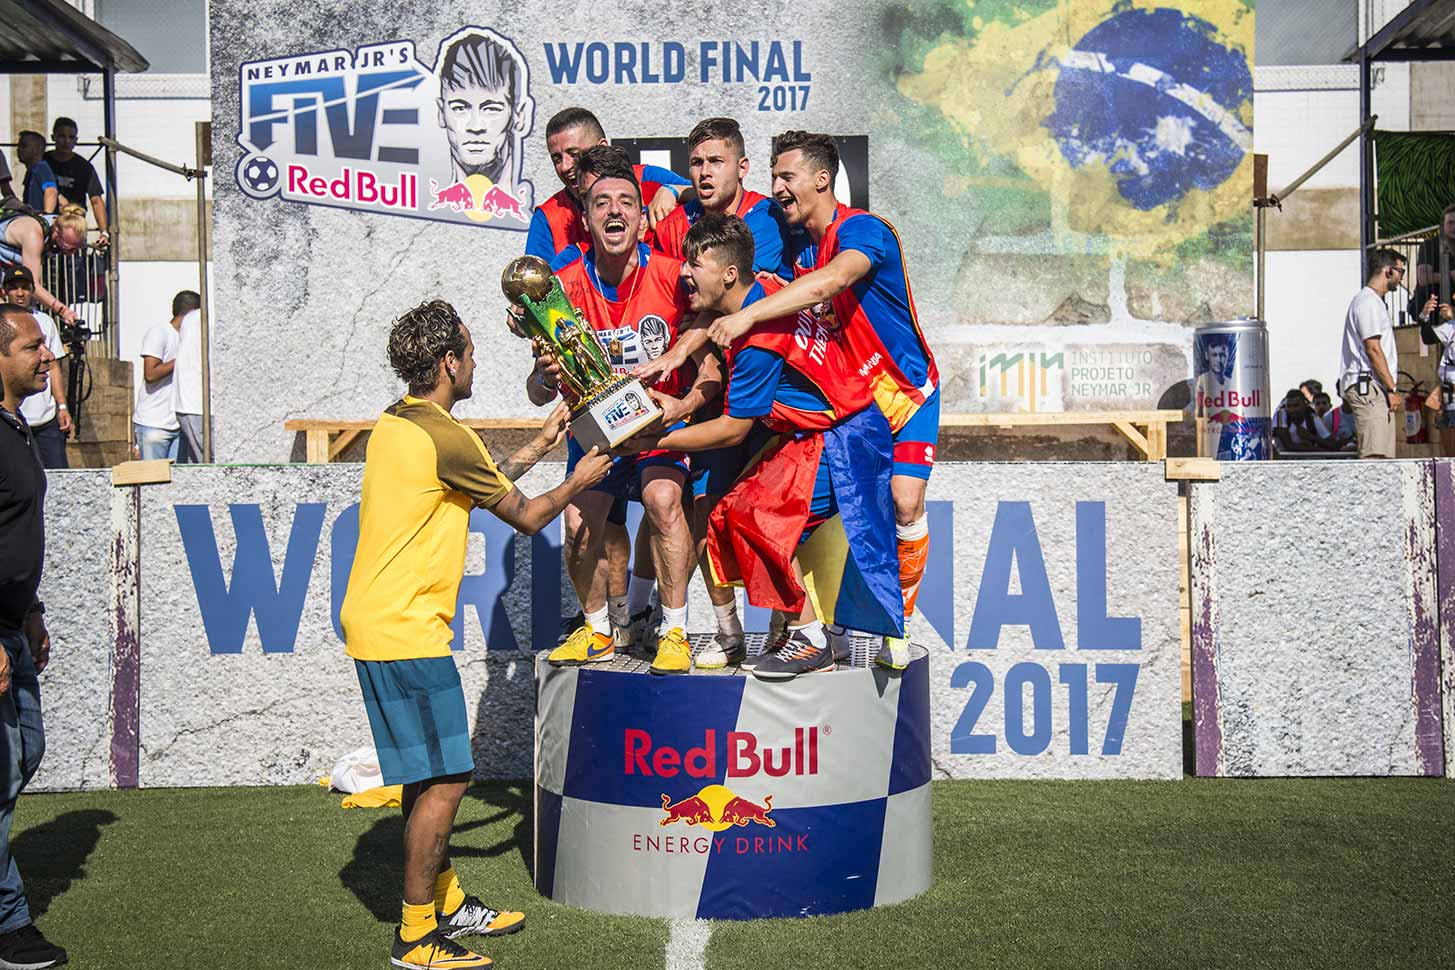 Neymar Jr's Five World Final Brazil